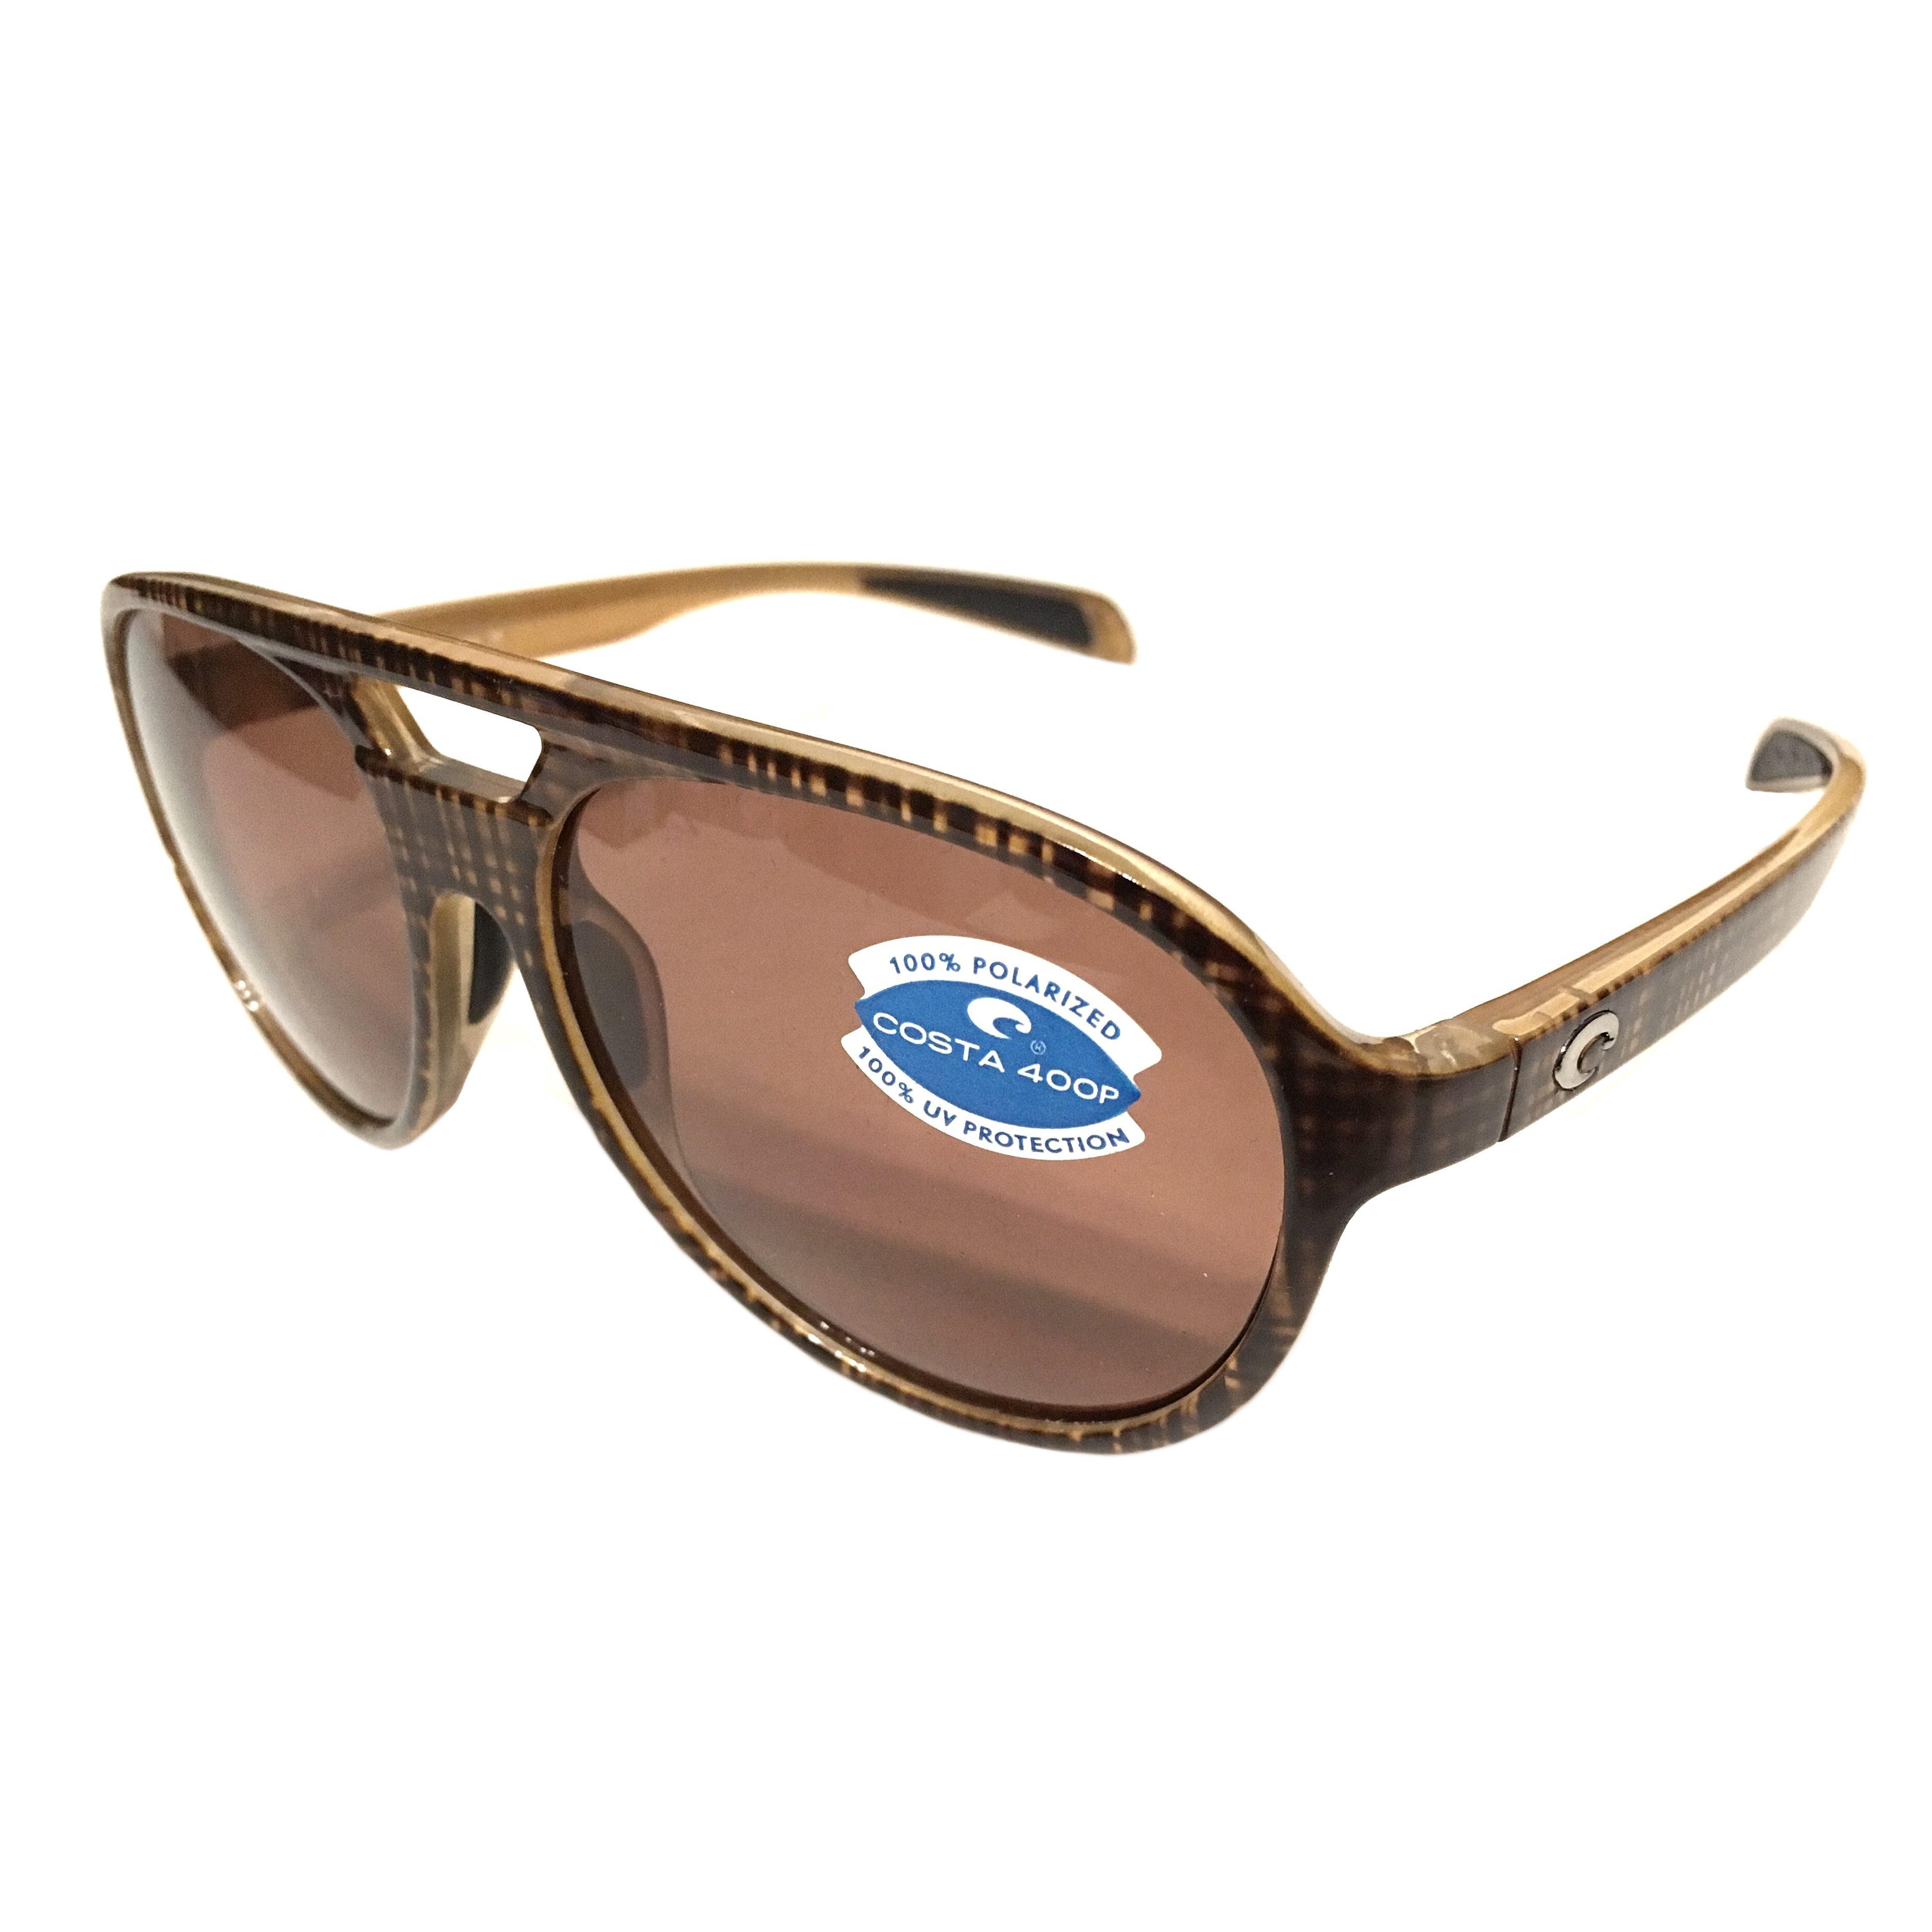 11b8a67a8e Costa Del Mar Seapoint Sunglasses – Scotch Frame – Polarized Dark  Vermillion Lens